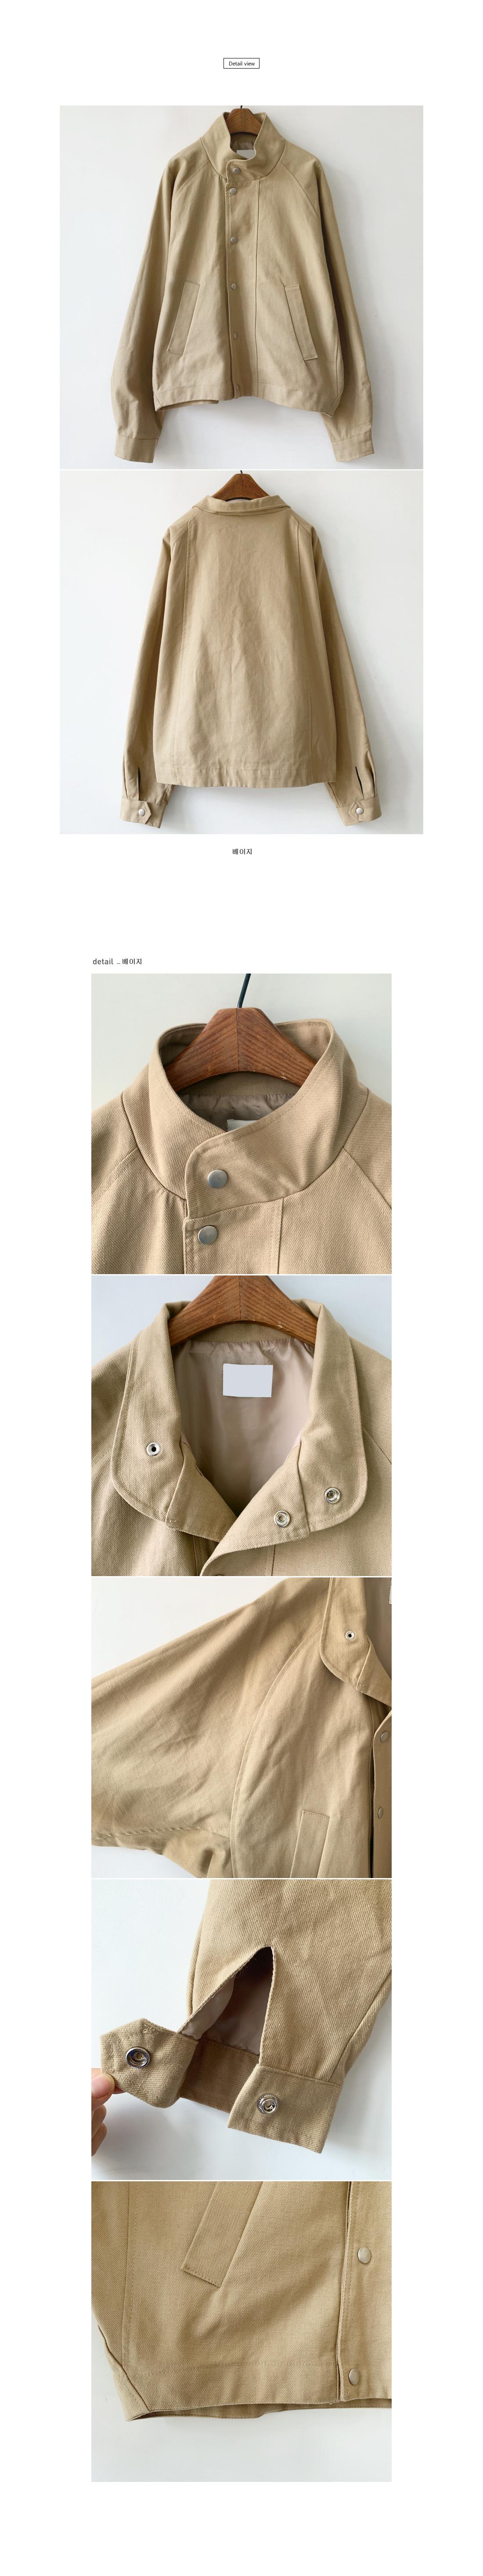 Farmer's cotton short jacket